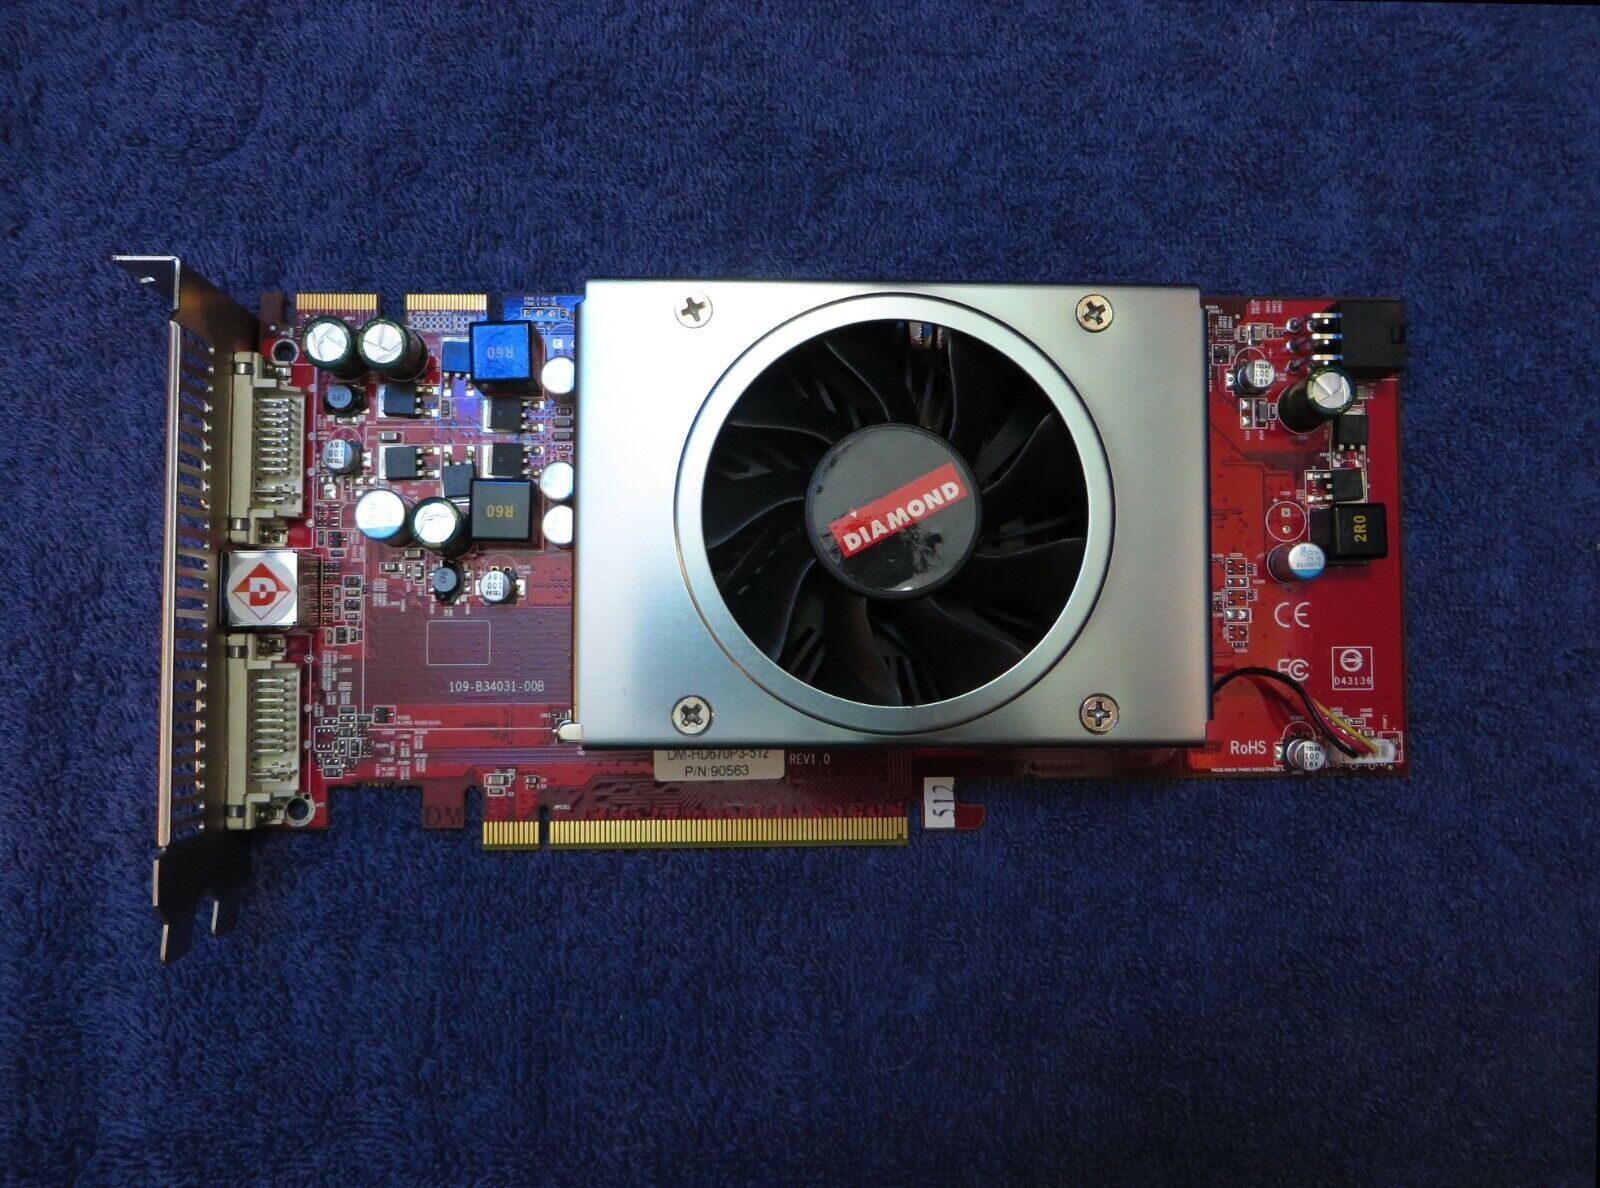 ATI Radeon Diamond HD 3850 512MB PCIE Video Graphics Card DM-HD670P3-512